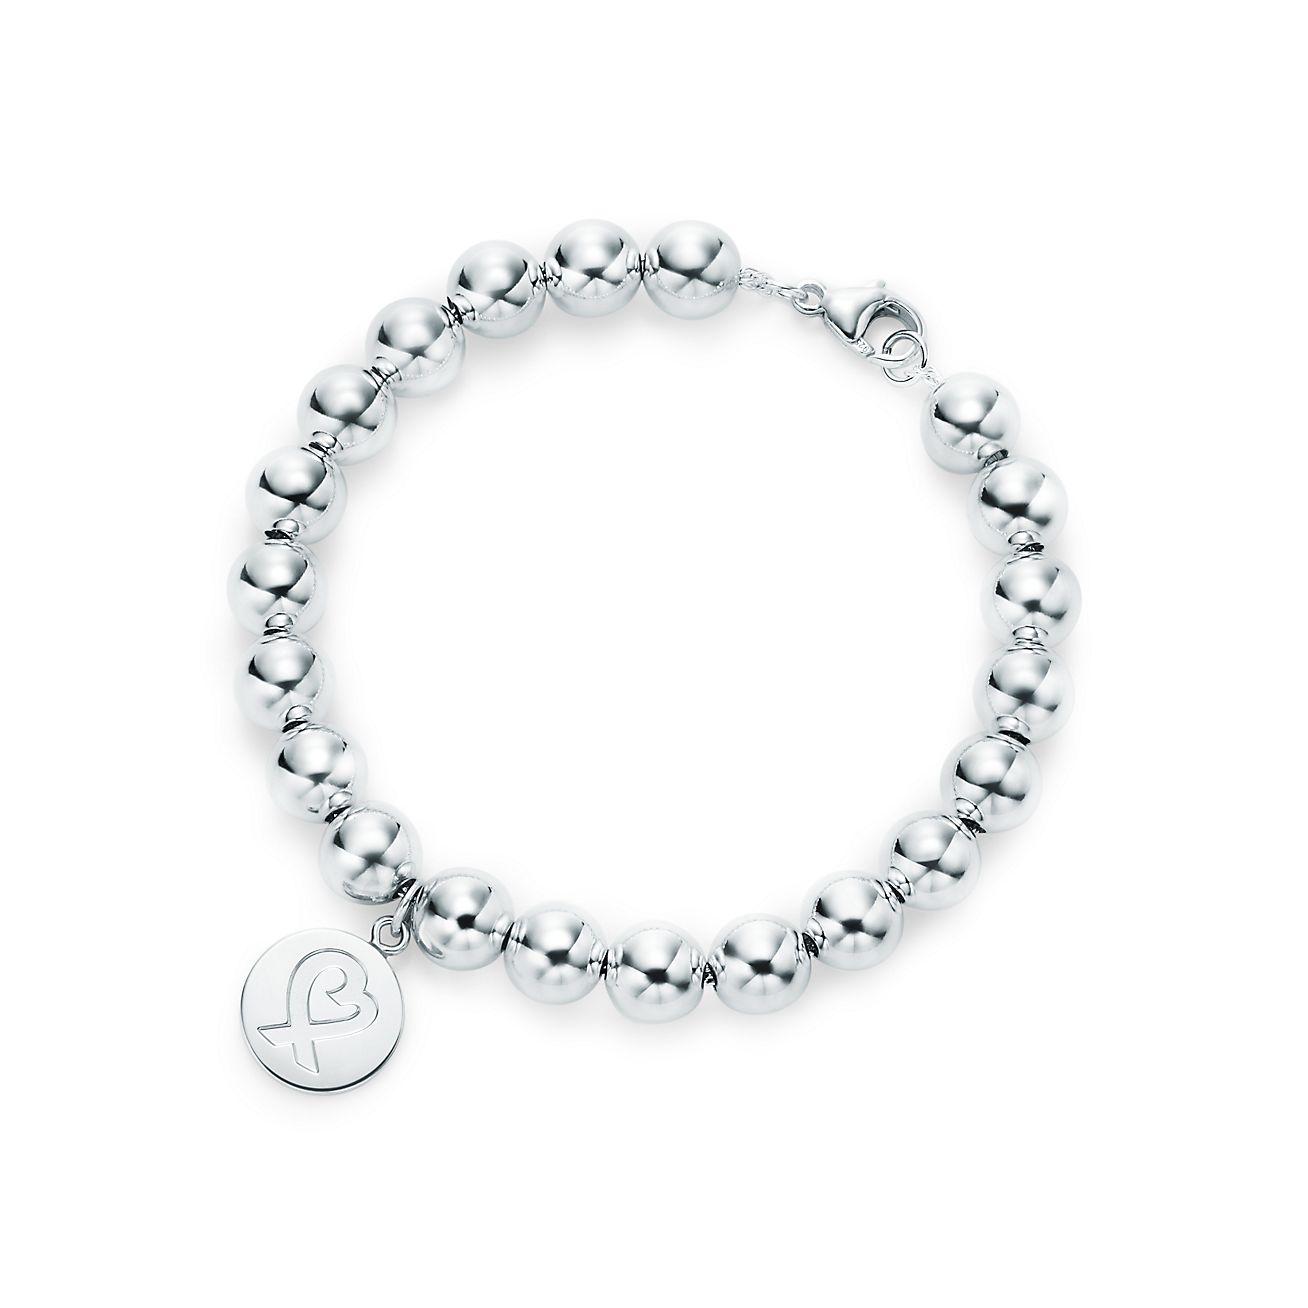 Paloma Pico Loving Heart Bead Bracelet